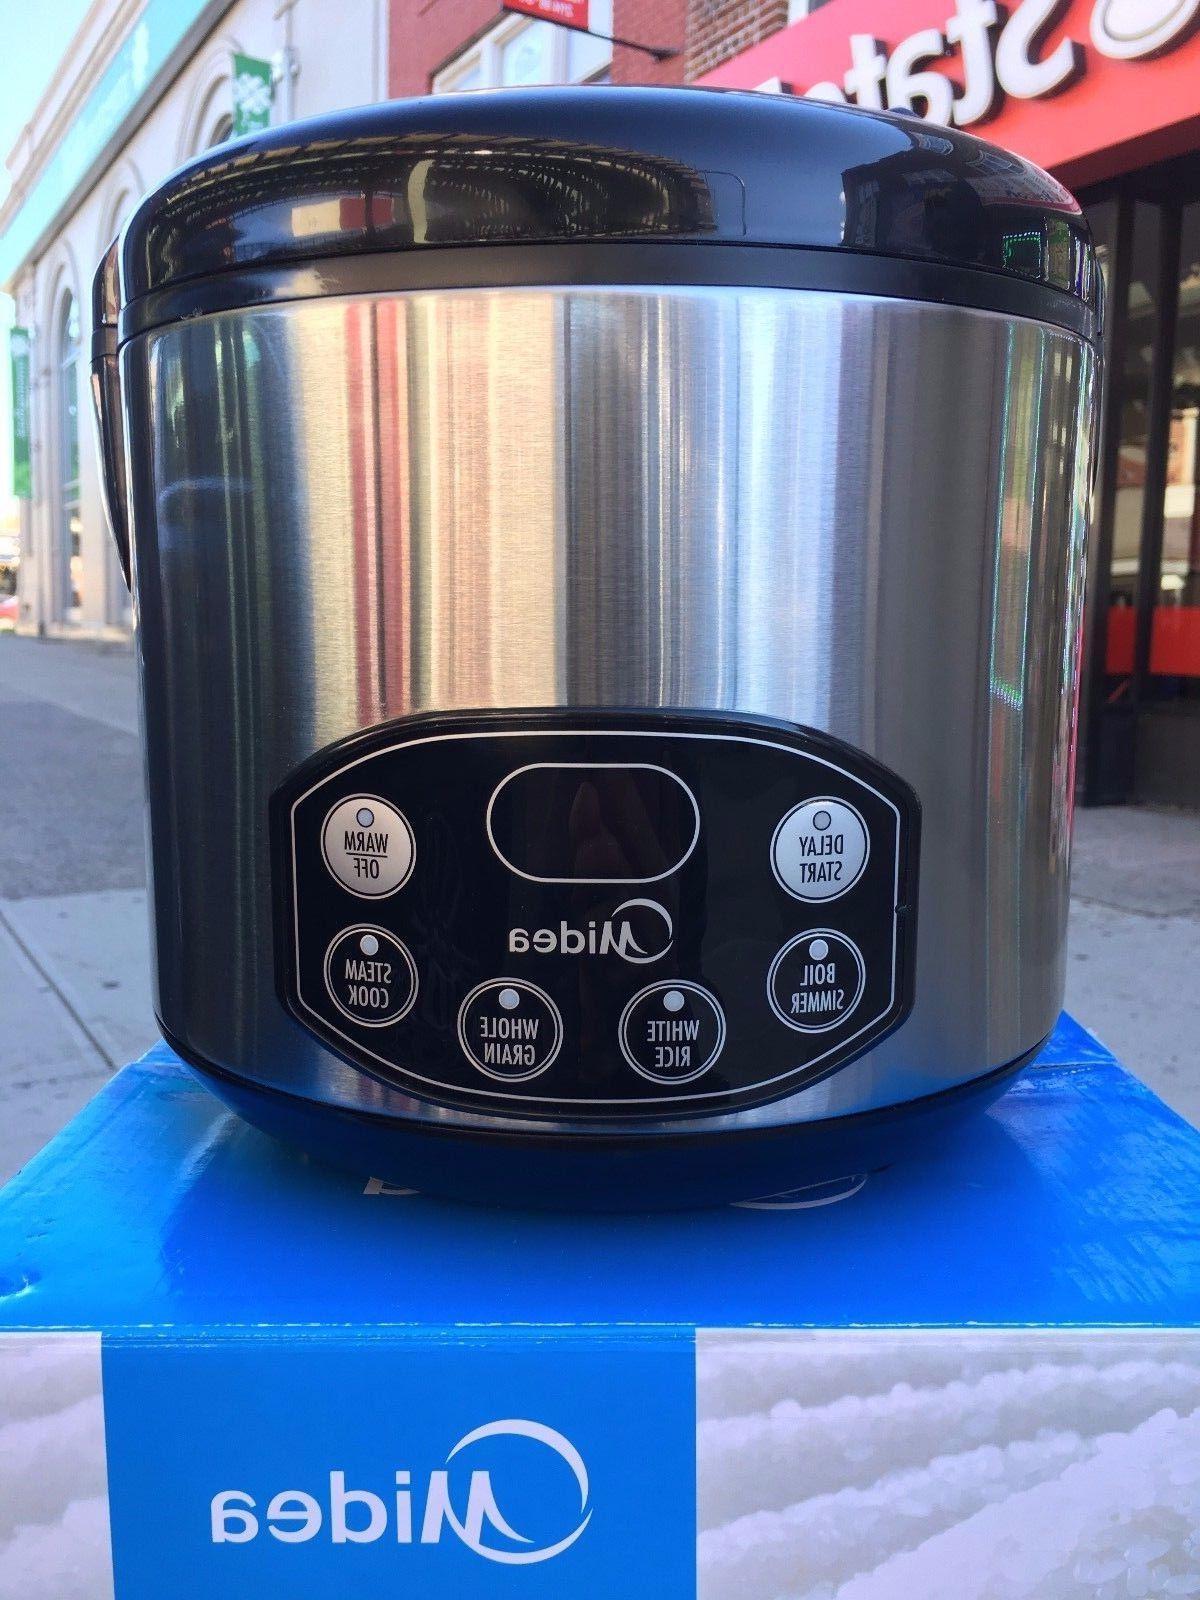 Midea Multifunction Digital Stainless steel  Rice cooker 10